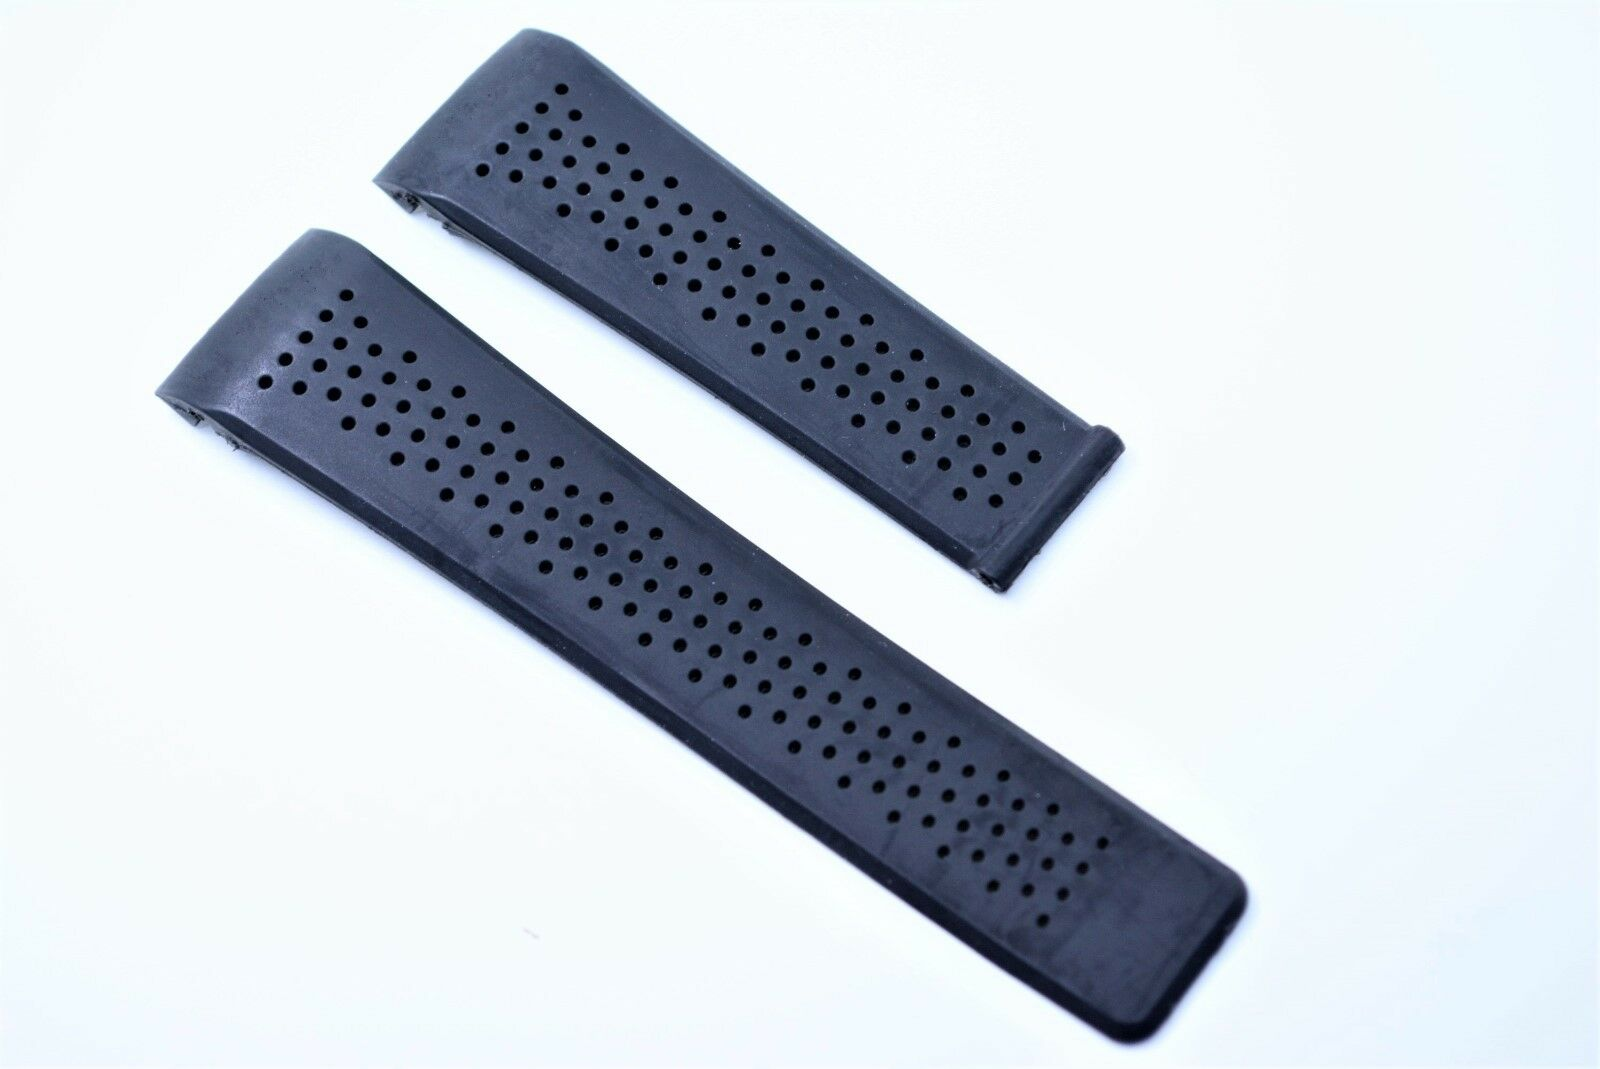 Uhrenarmband 24 mm 22 mm Schwarz für Tag heuer Carrera Calibre watch band rubber